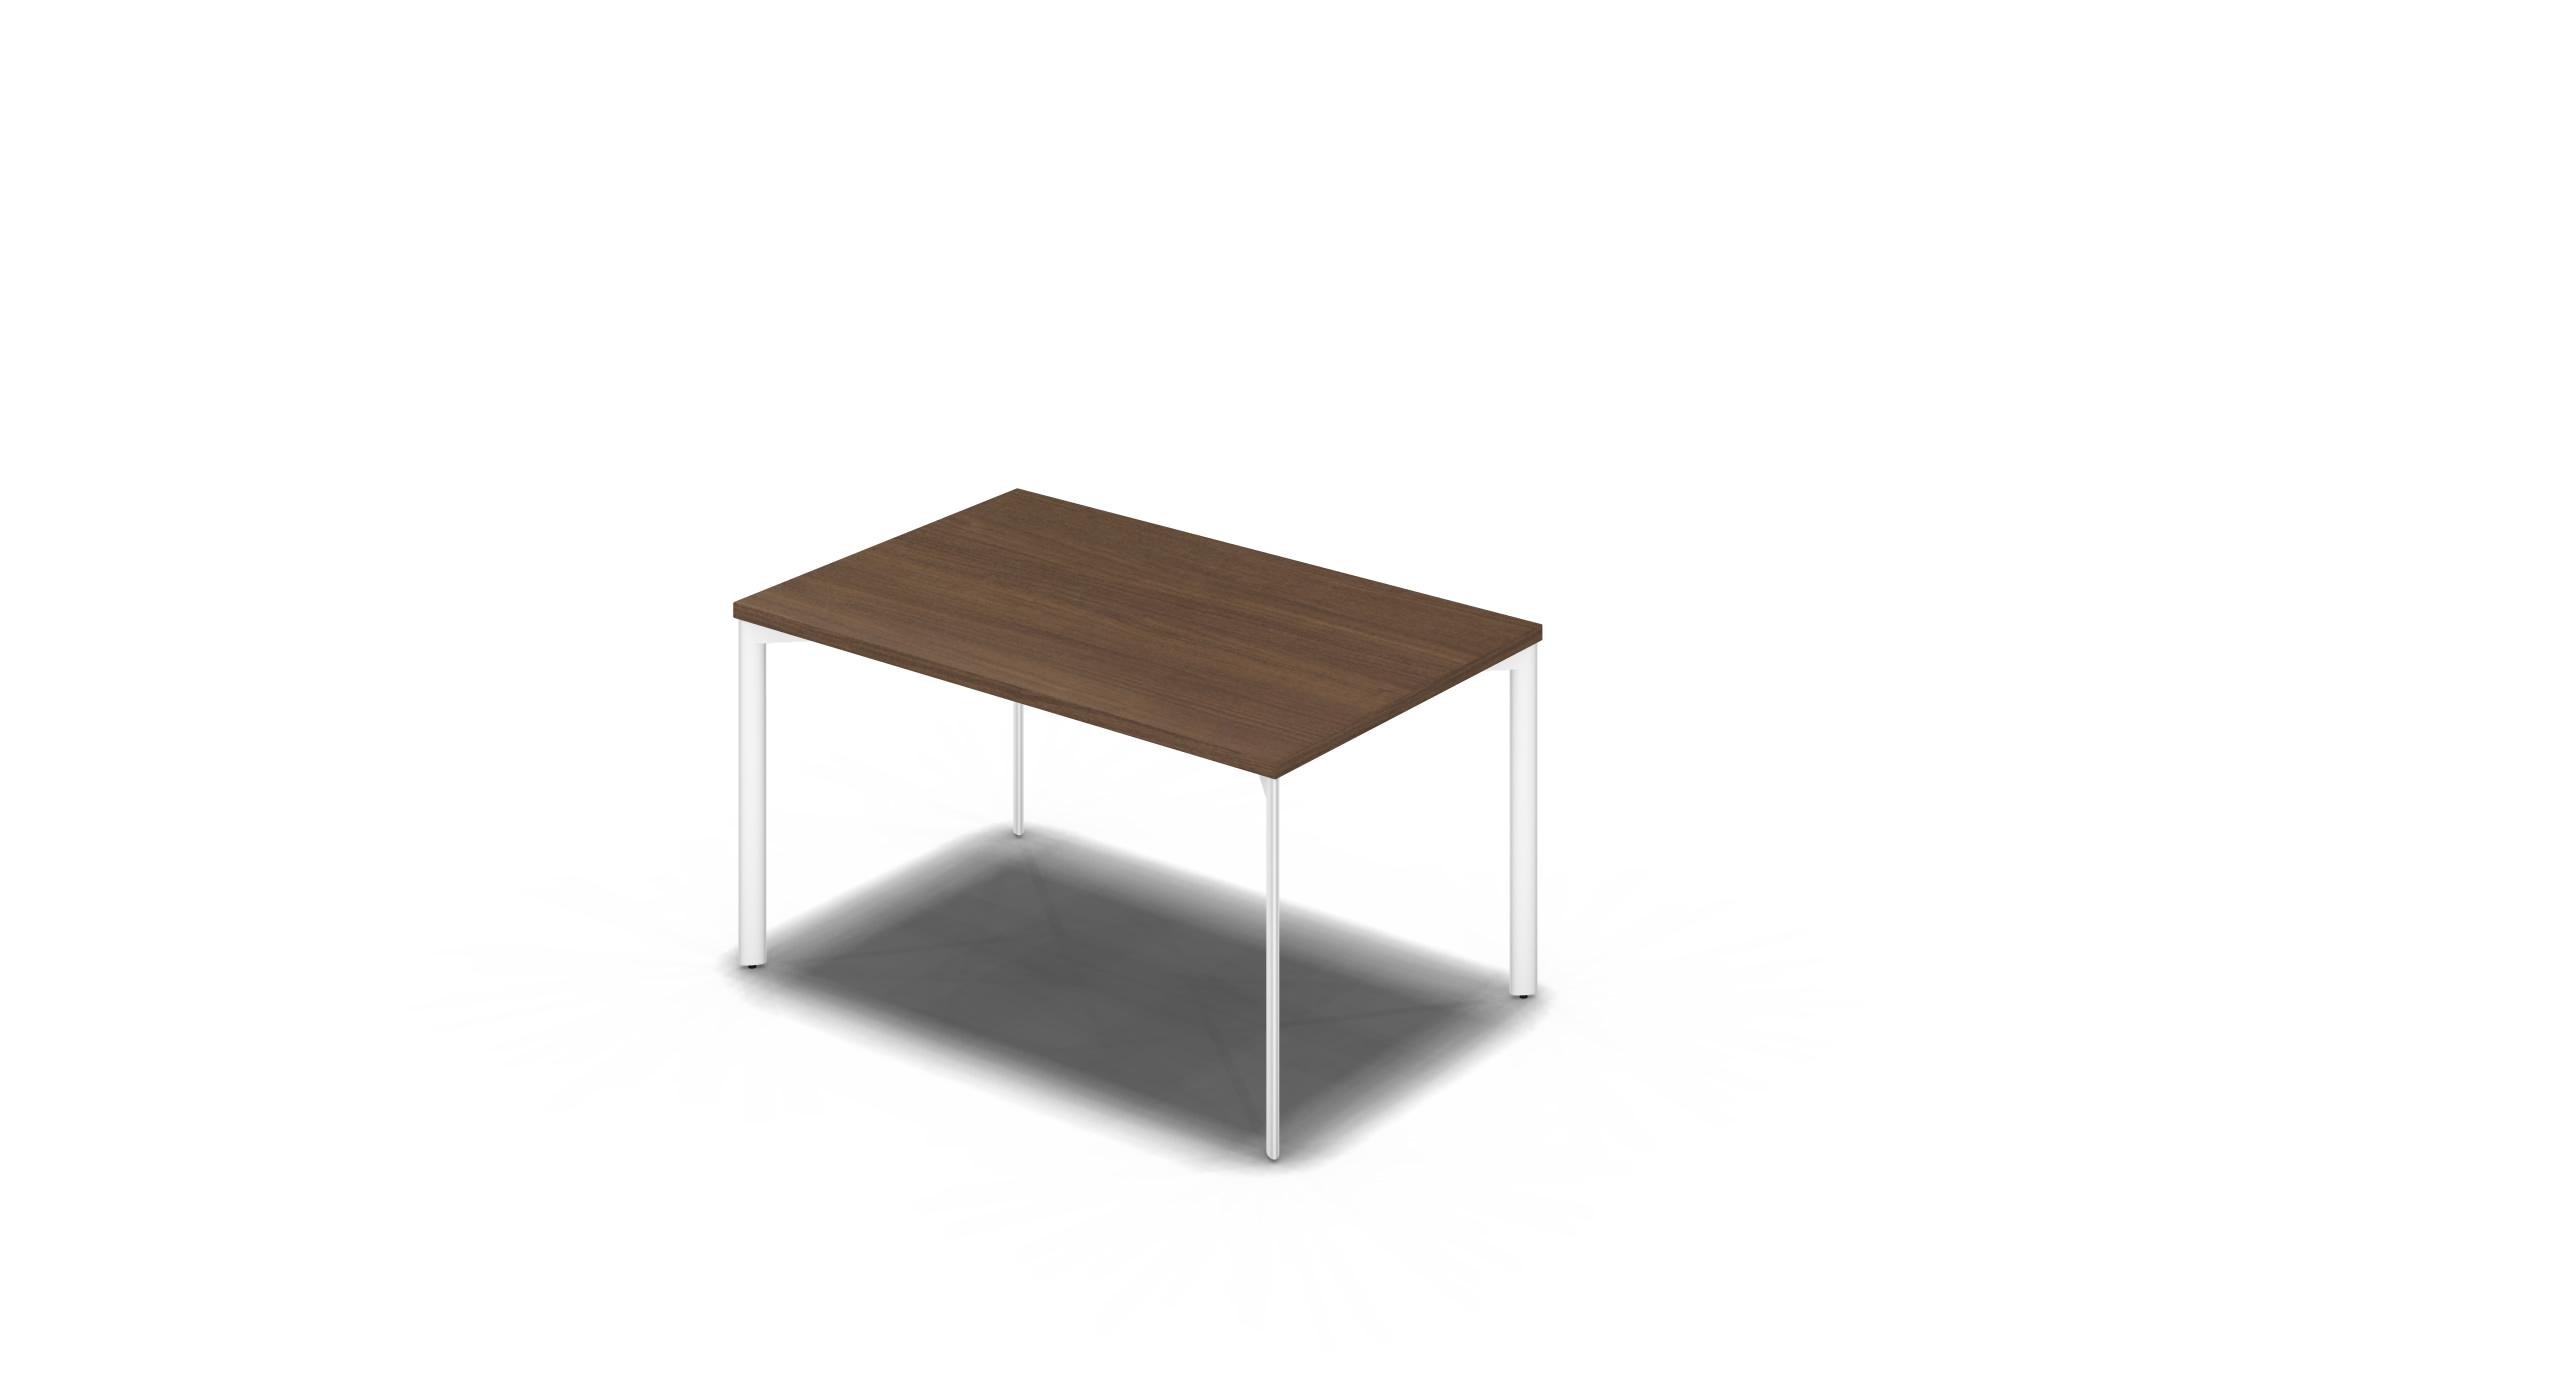 Table_Slim_1200x750_White_Walnut_noOption